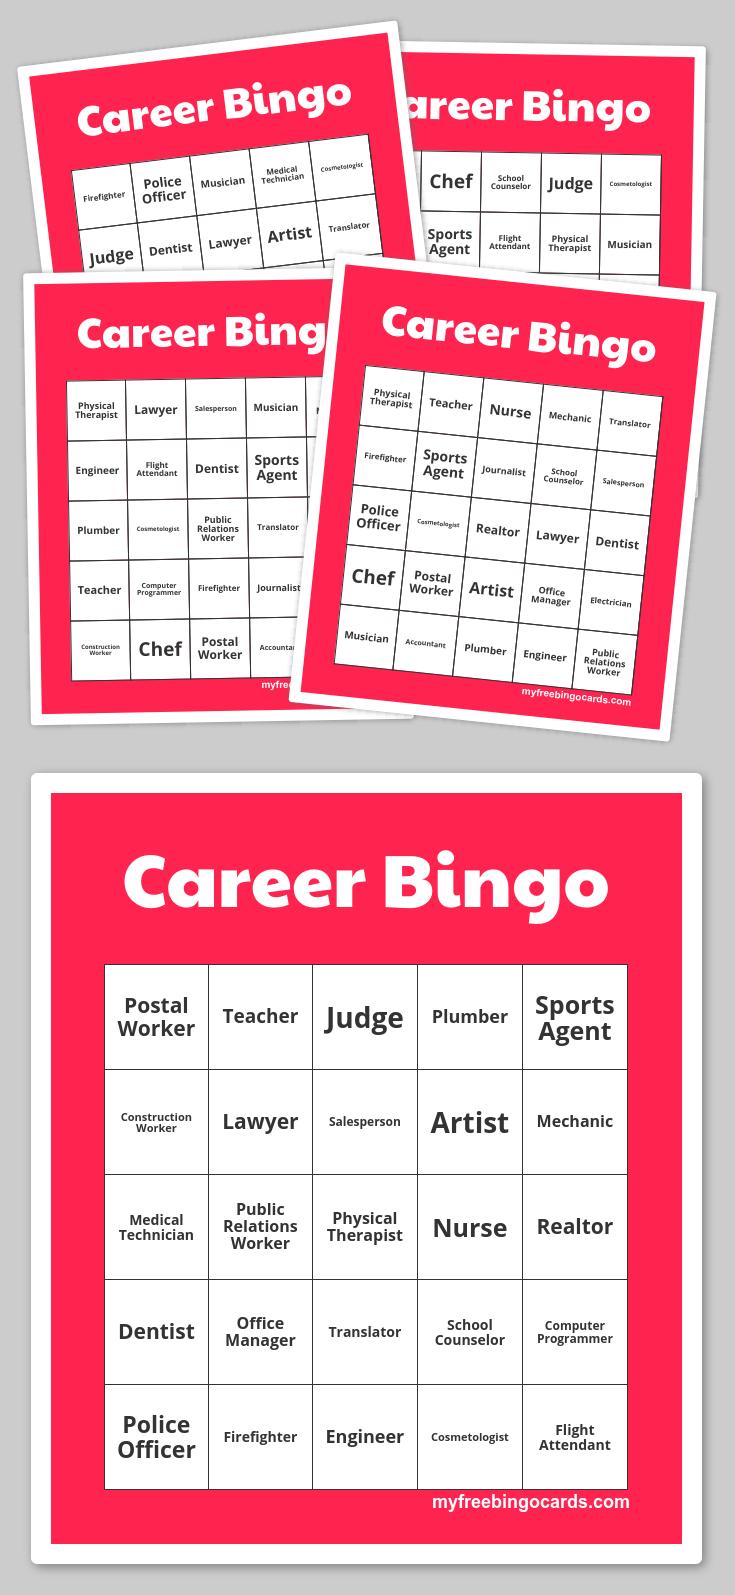 Career Bingo | Free Printable Bingo Cards, Bingo Cards, Free